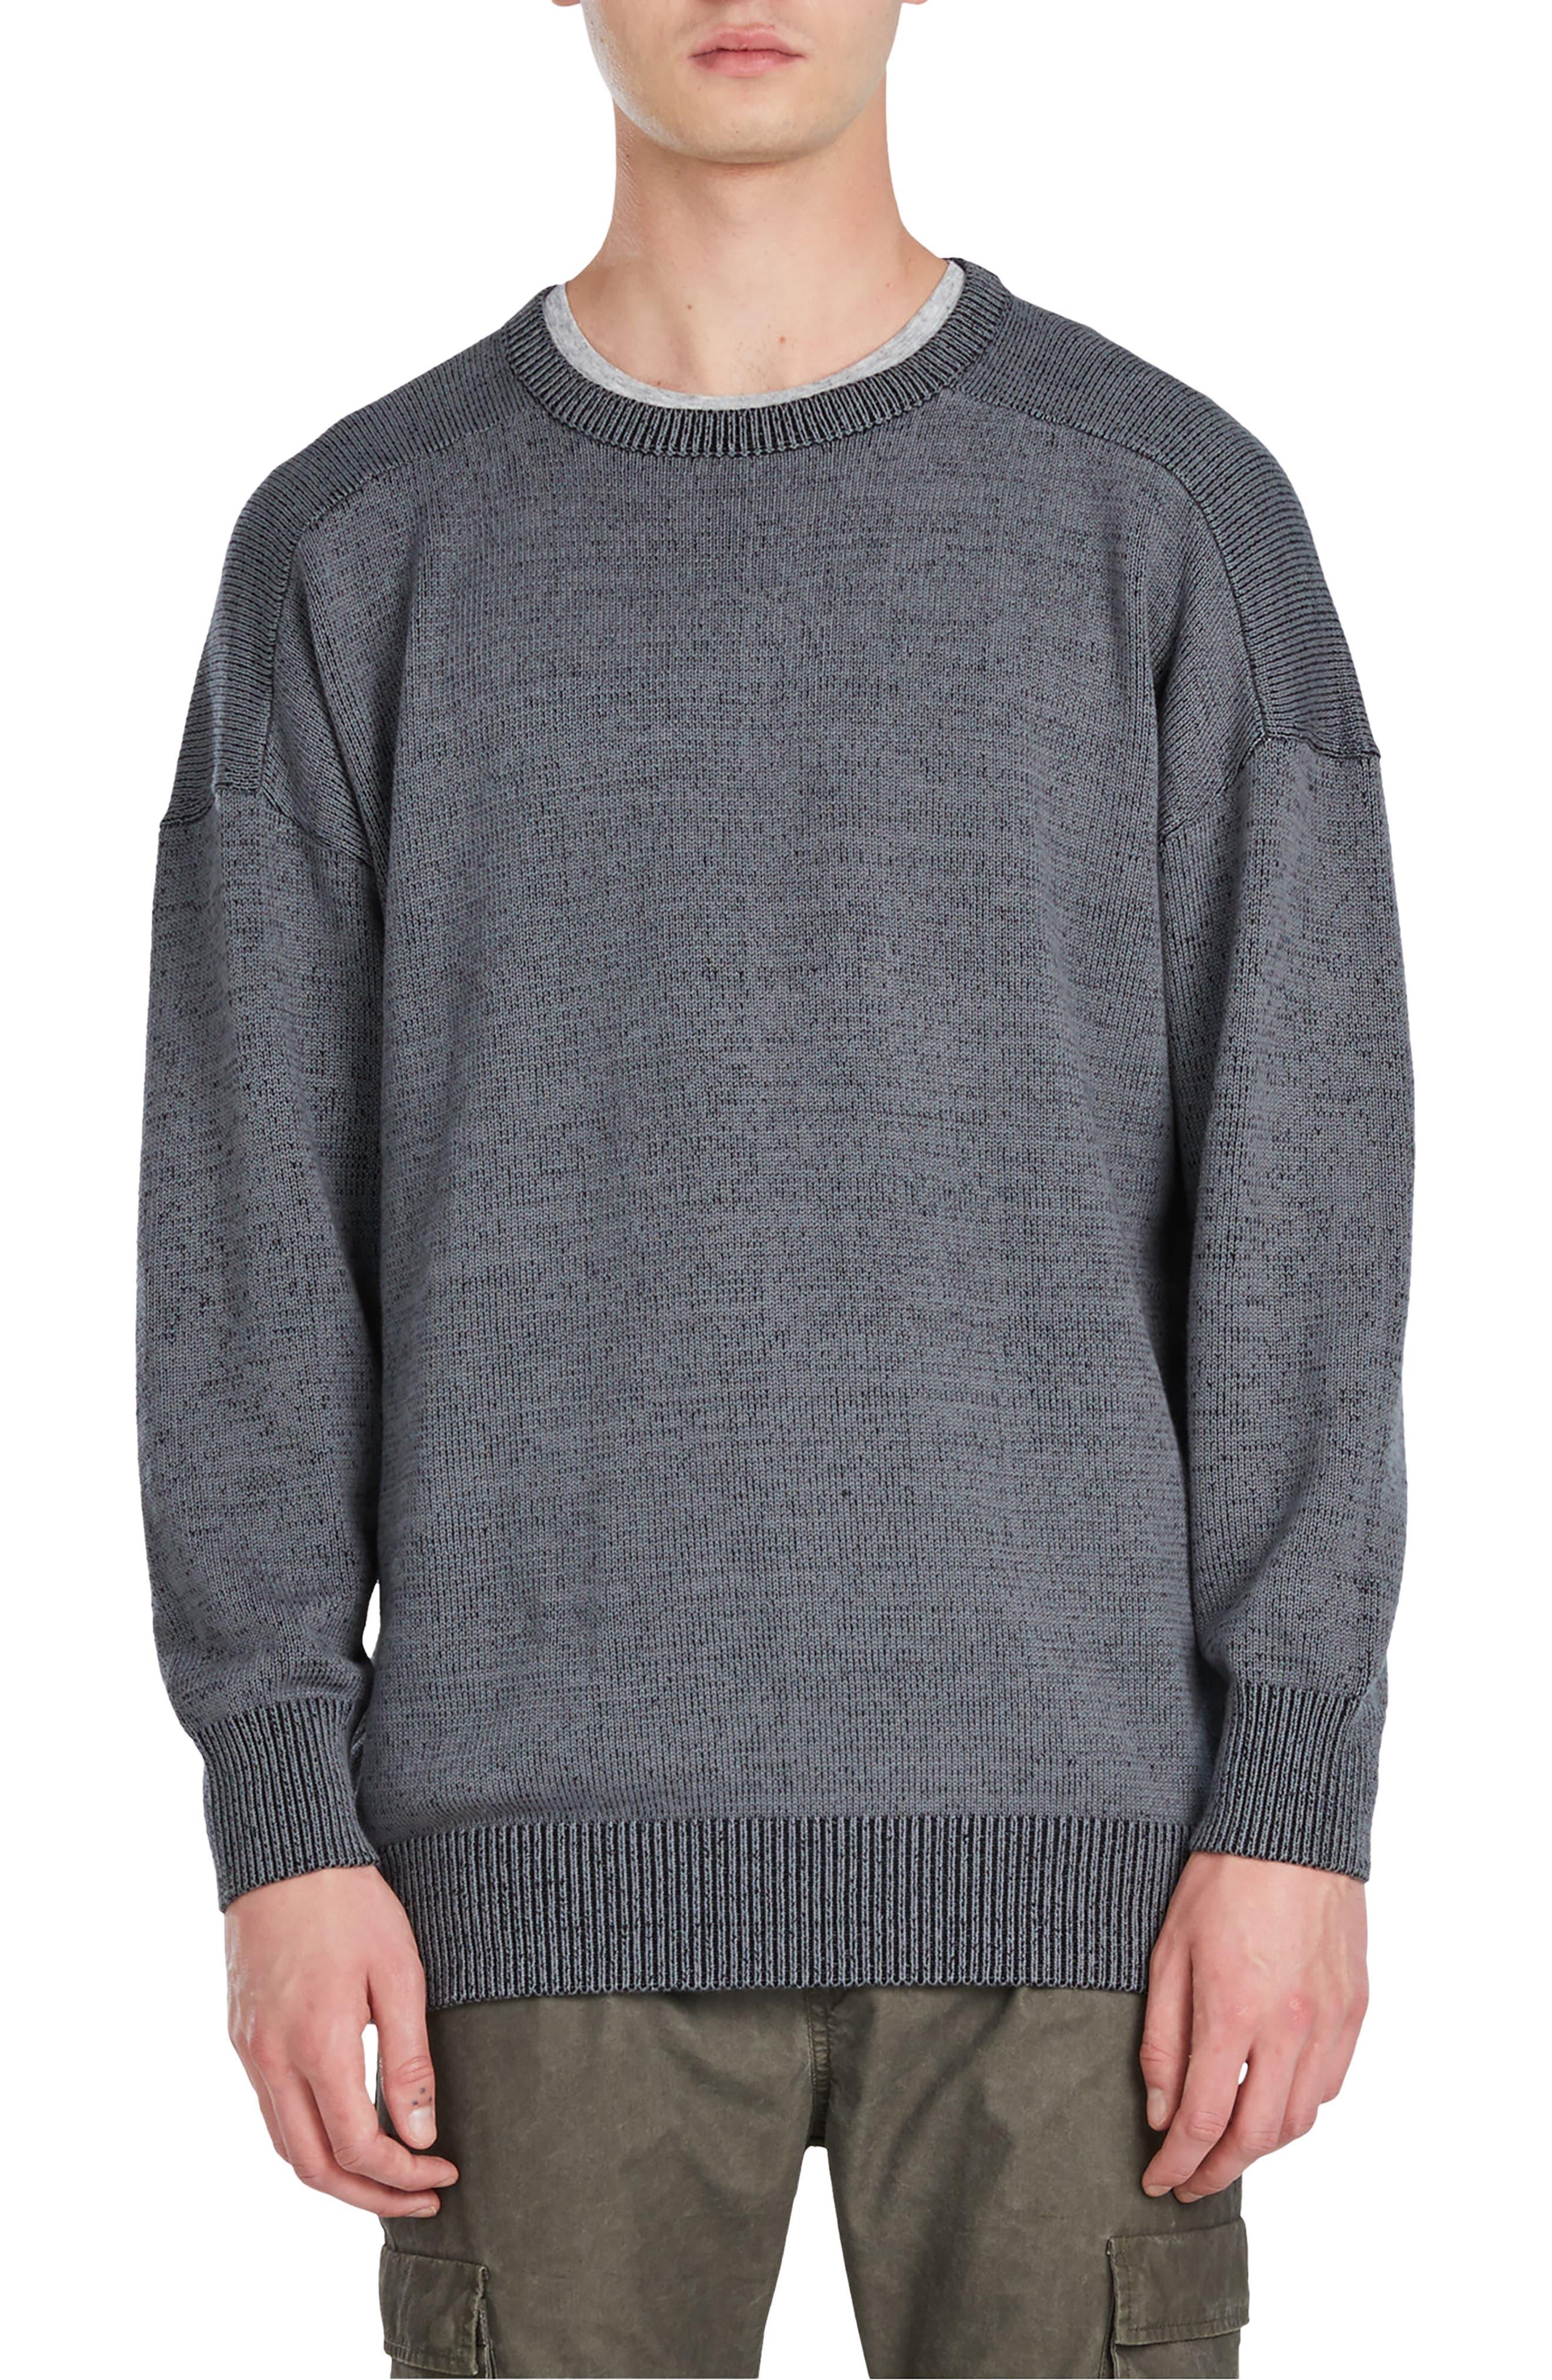 Cotch Knit Sweater,                             Main thumbnail 1, color,